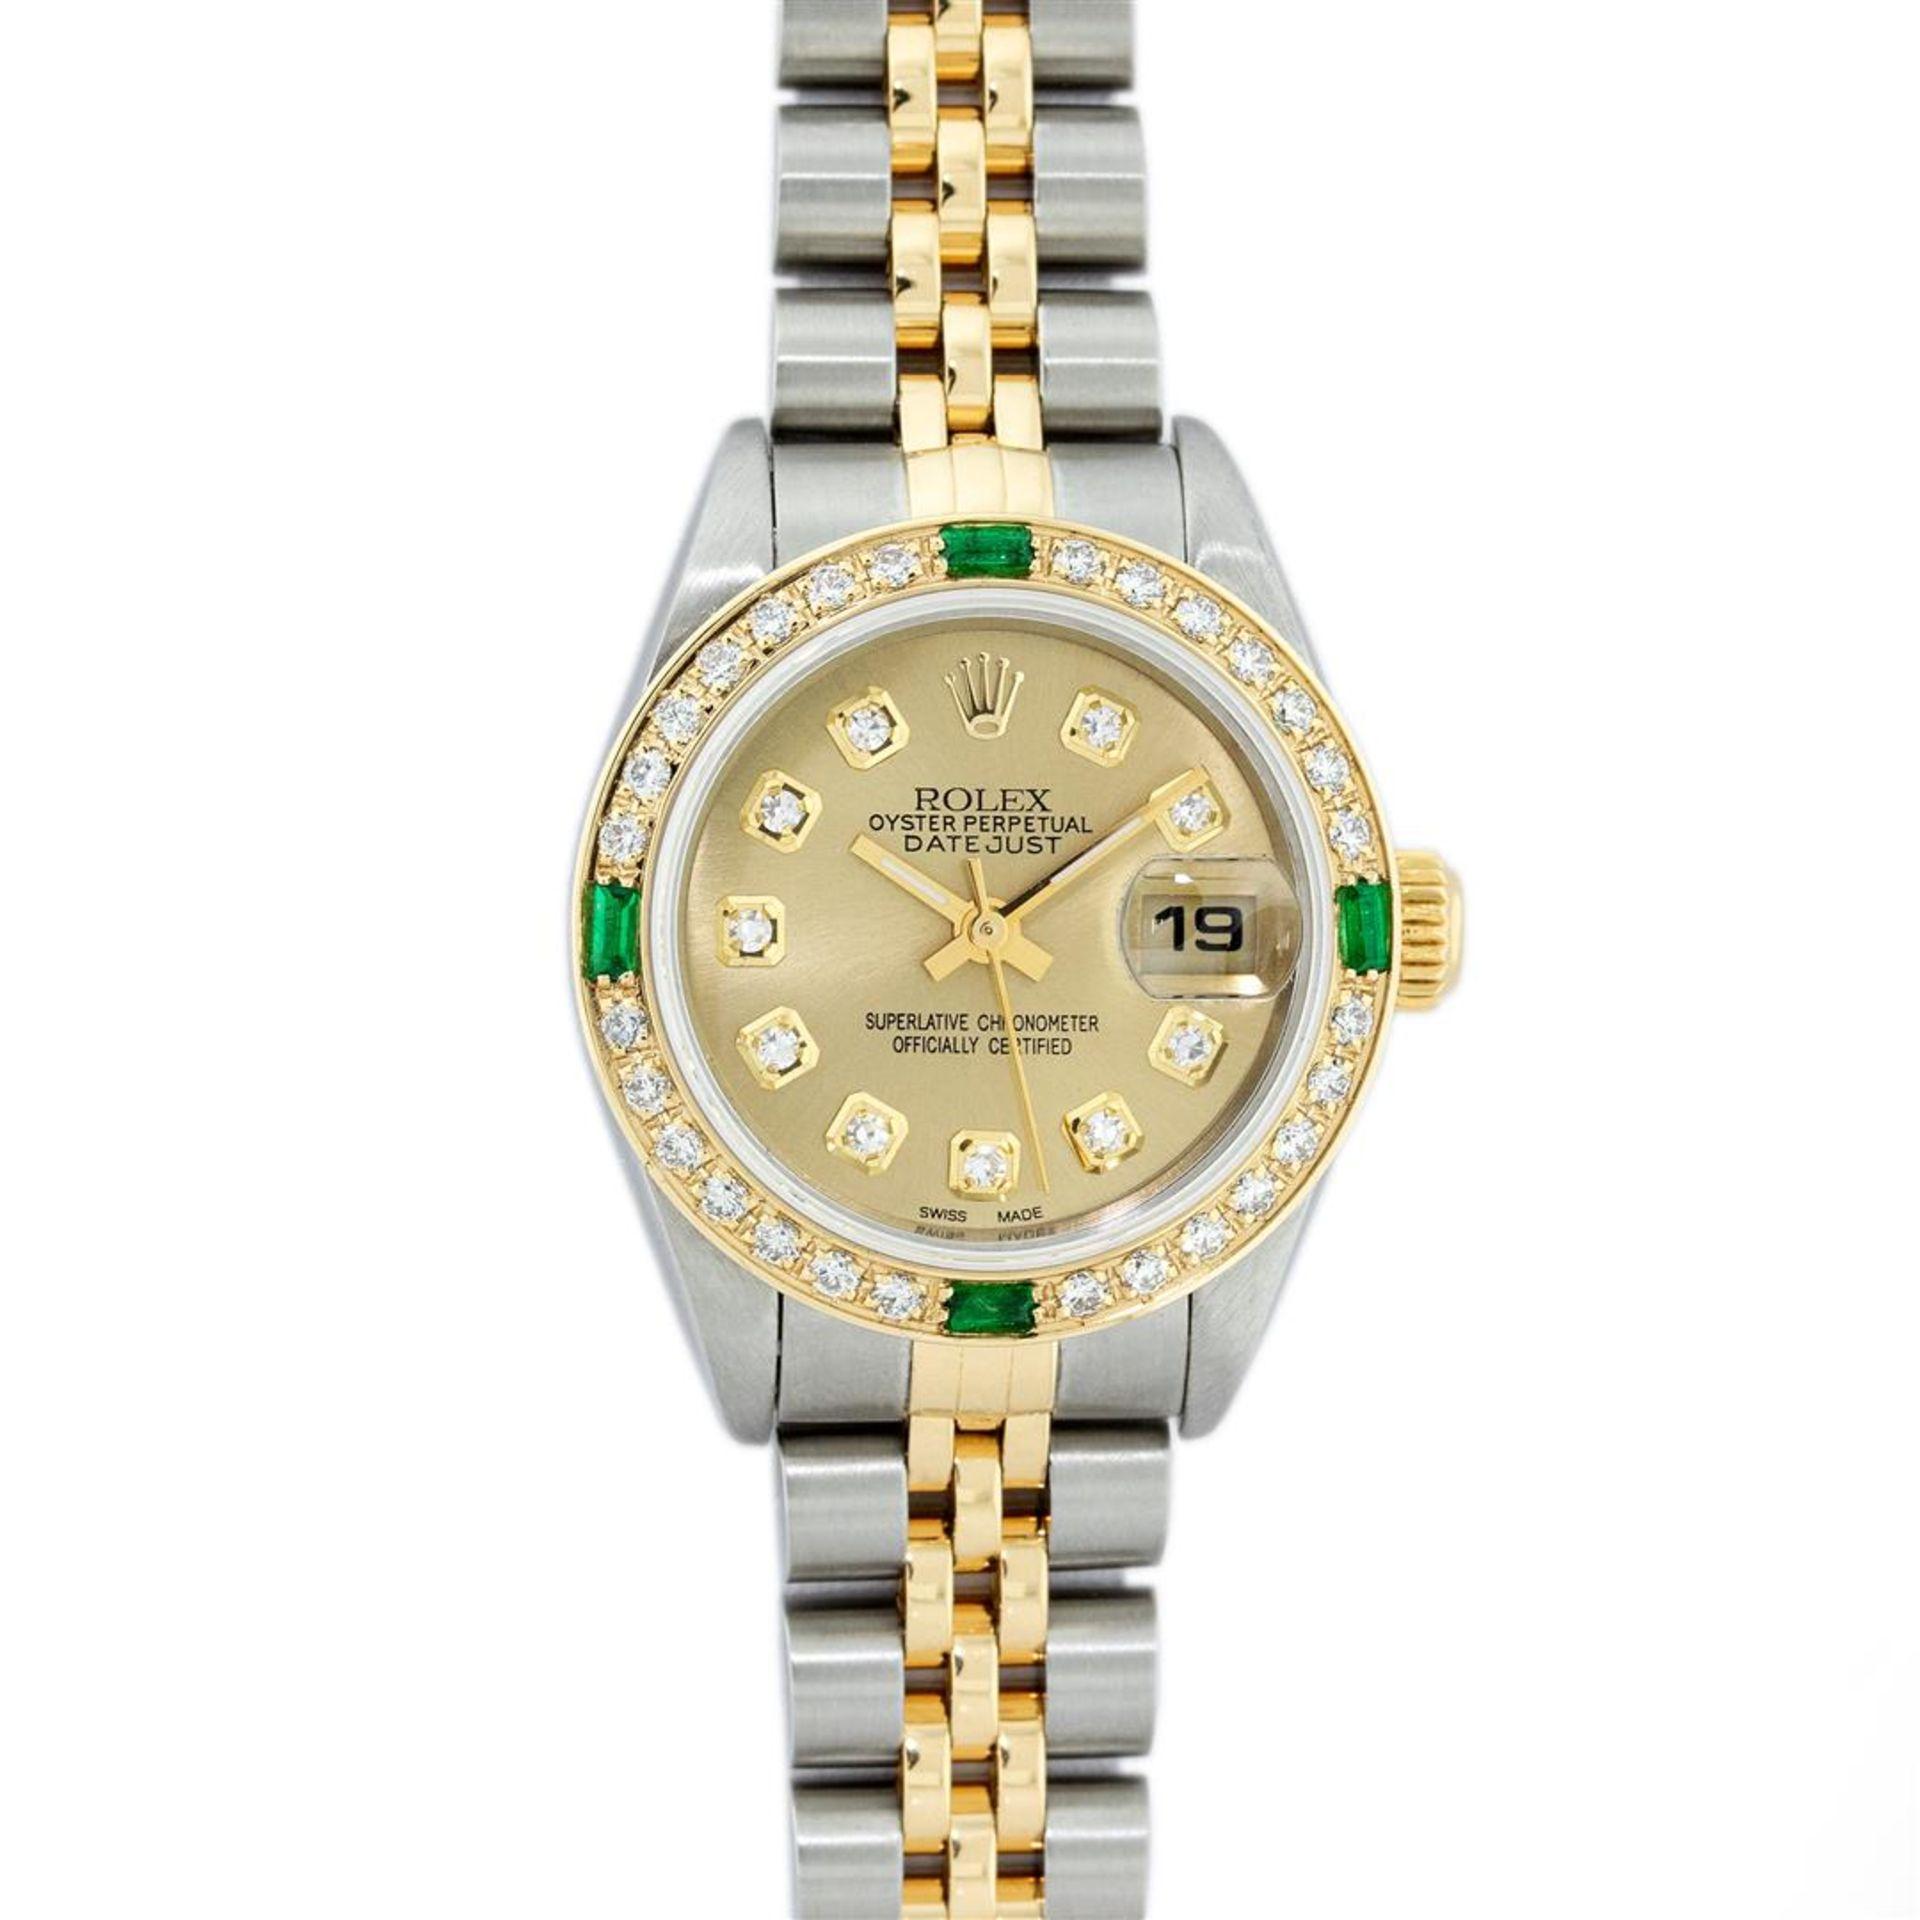 Rolex Ladies 2 Tone 18K Quickset Champagne Diamond & Emerald Datejust Wristwatch - Image 2 of 9